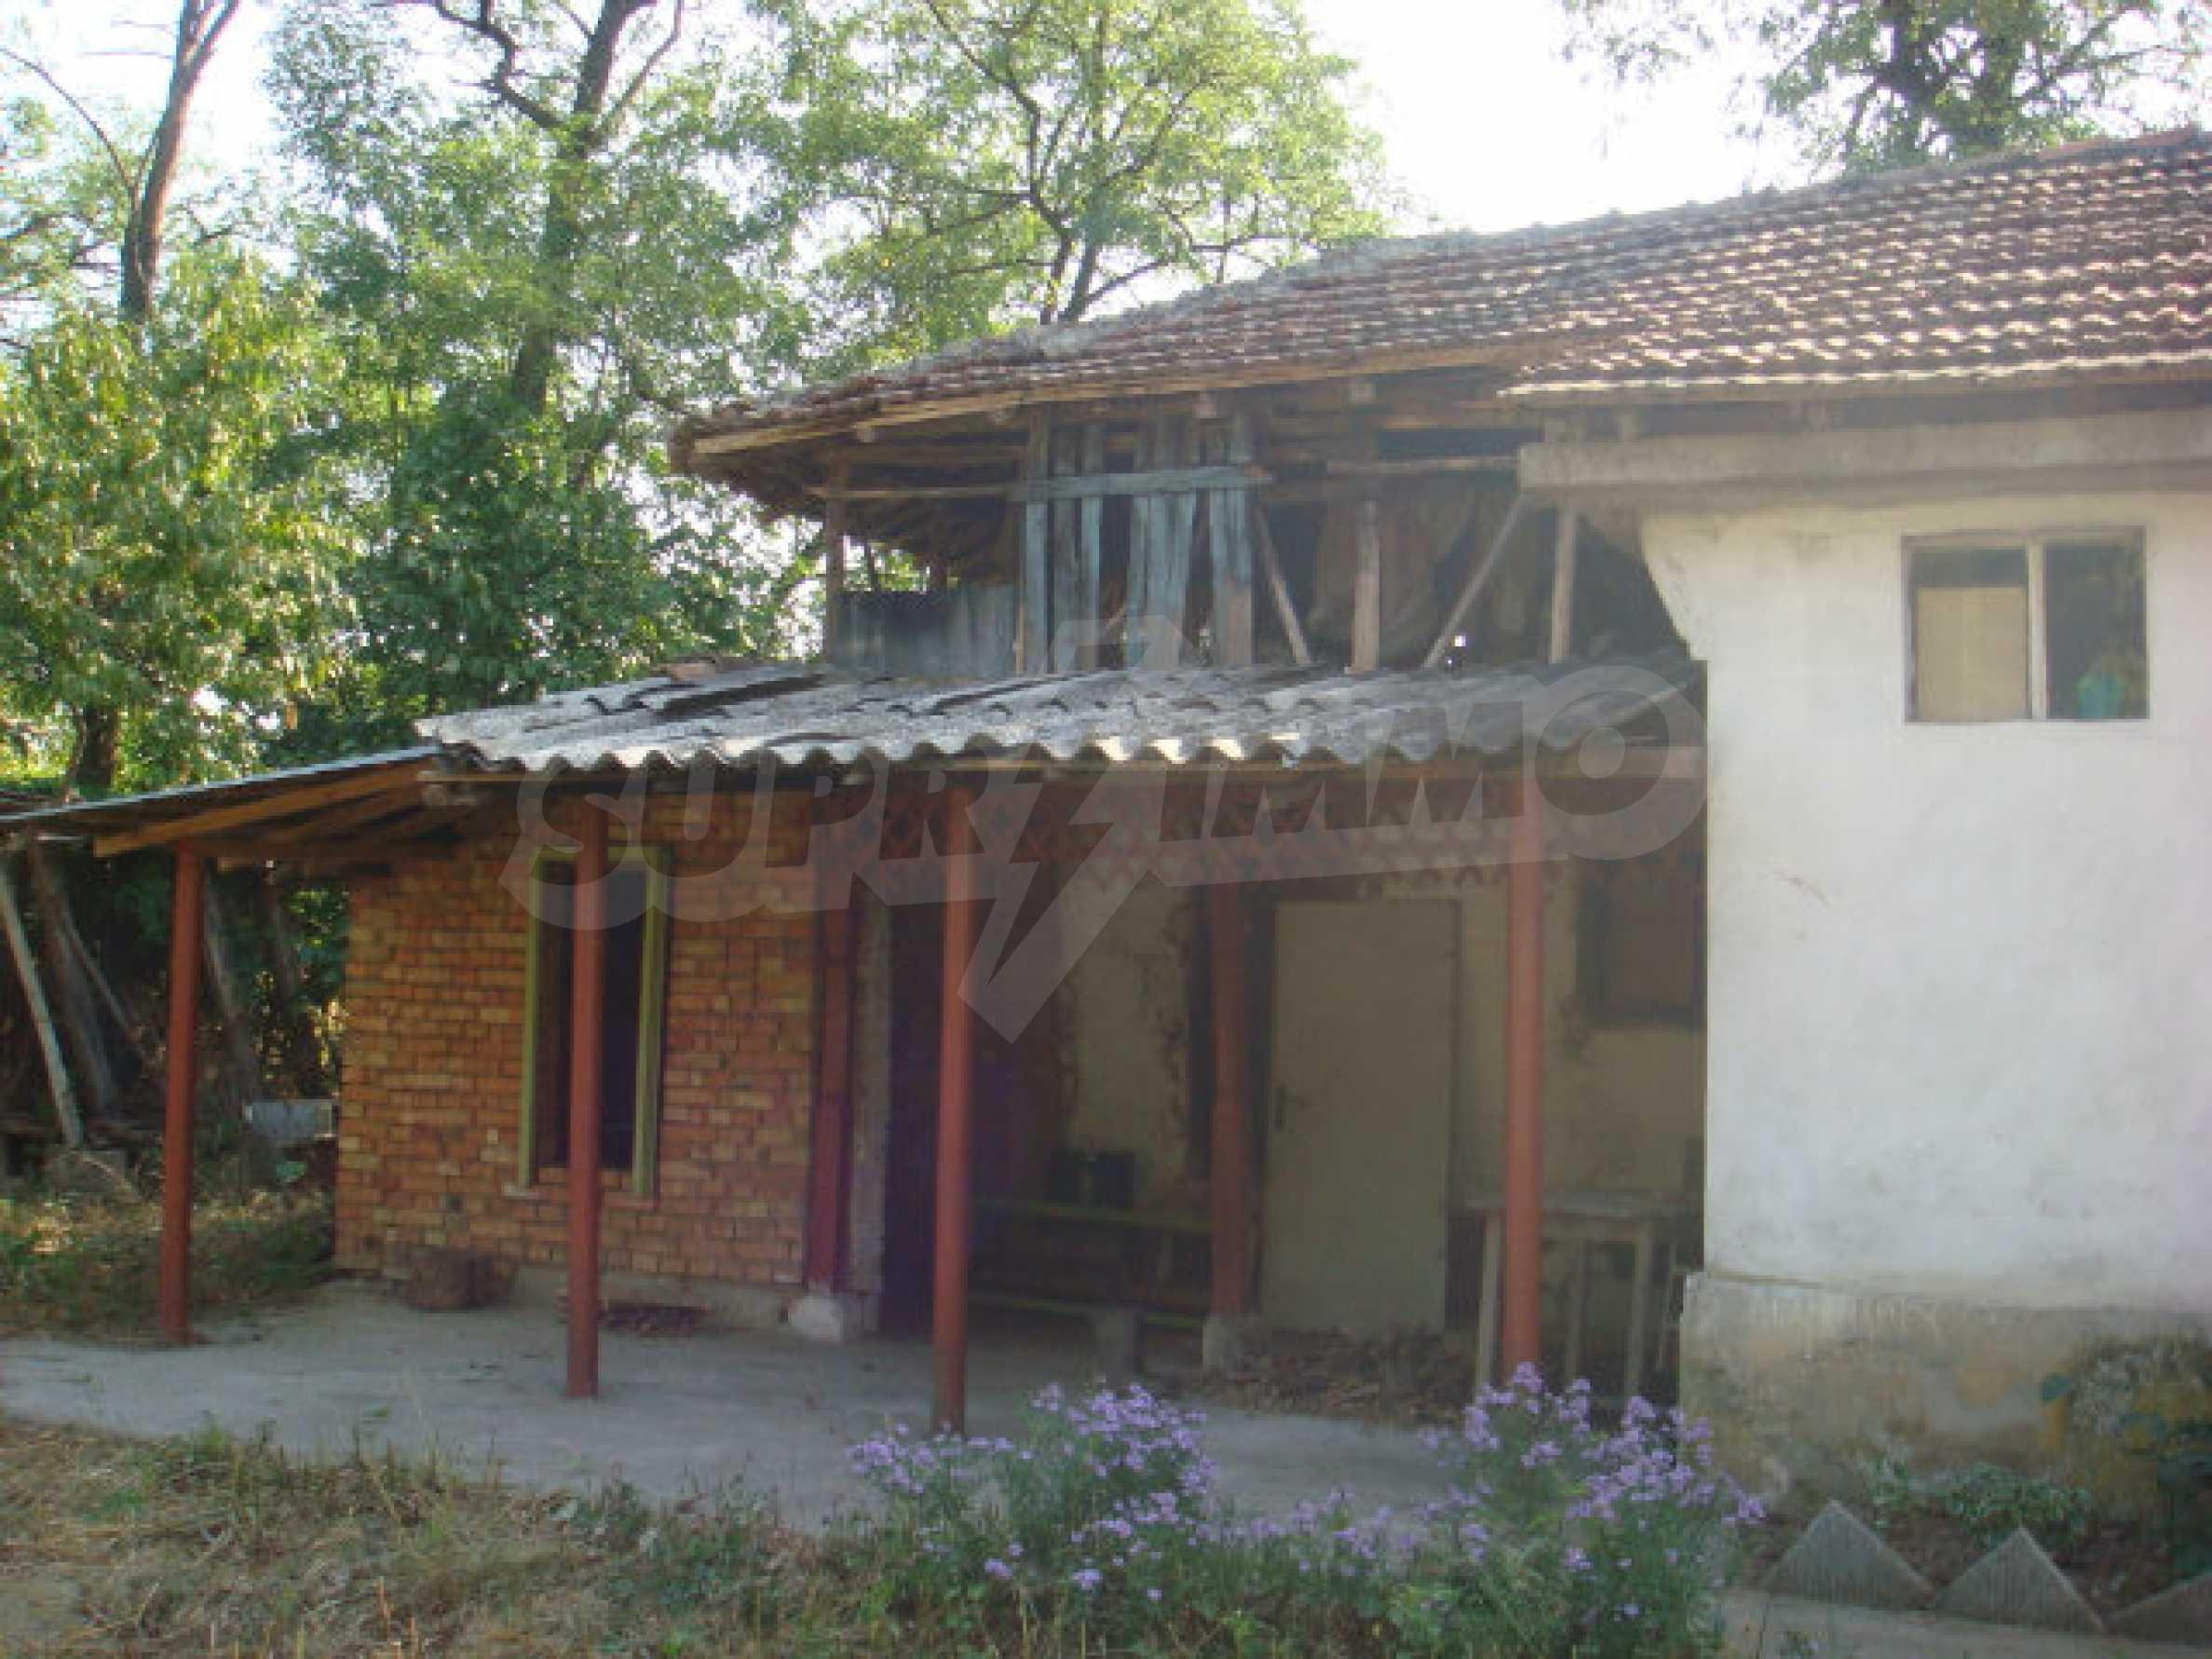 House for sale in village near Vidin 11